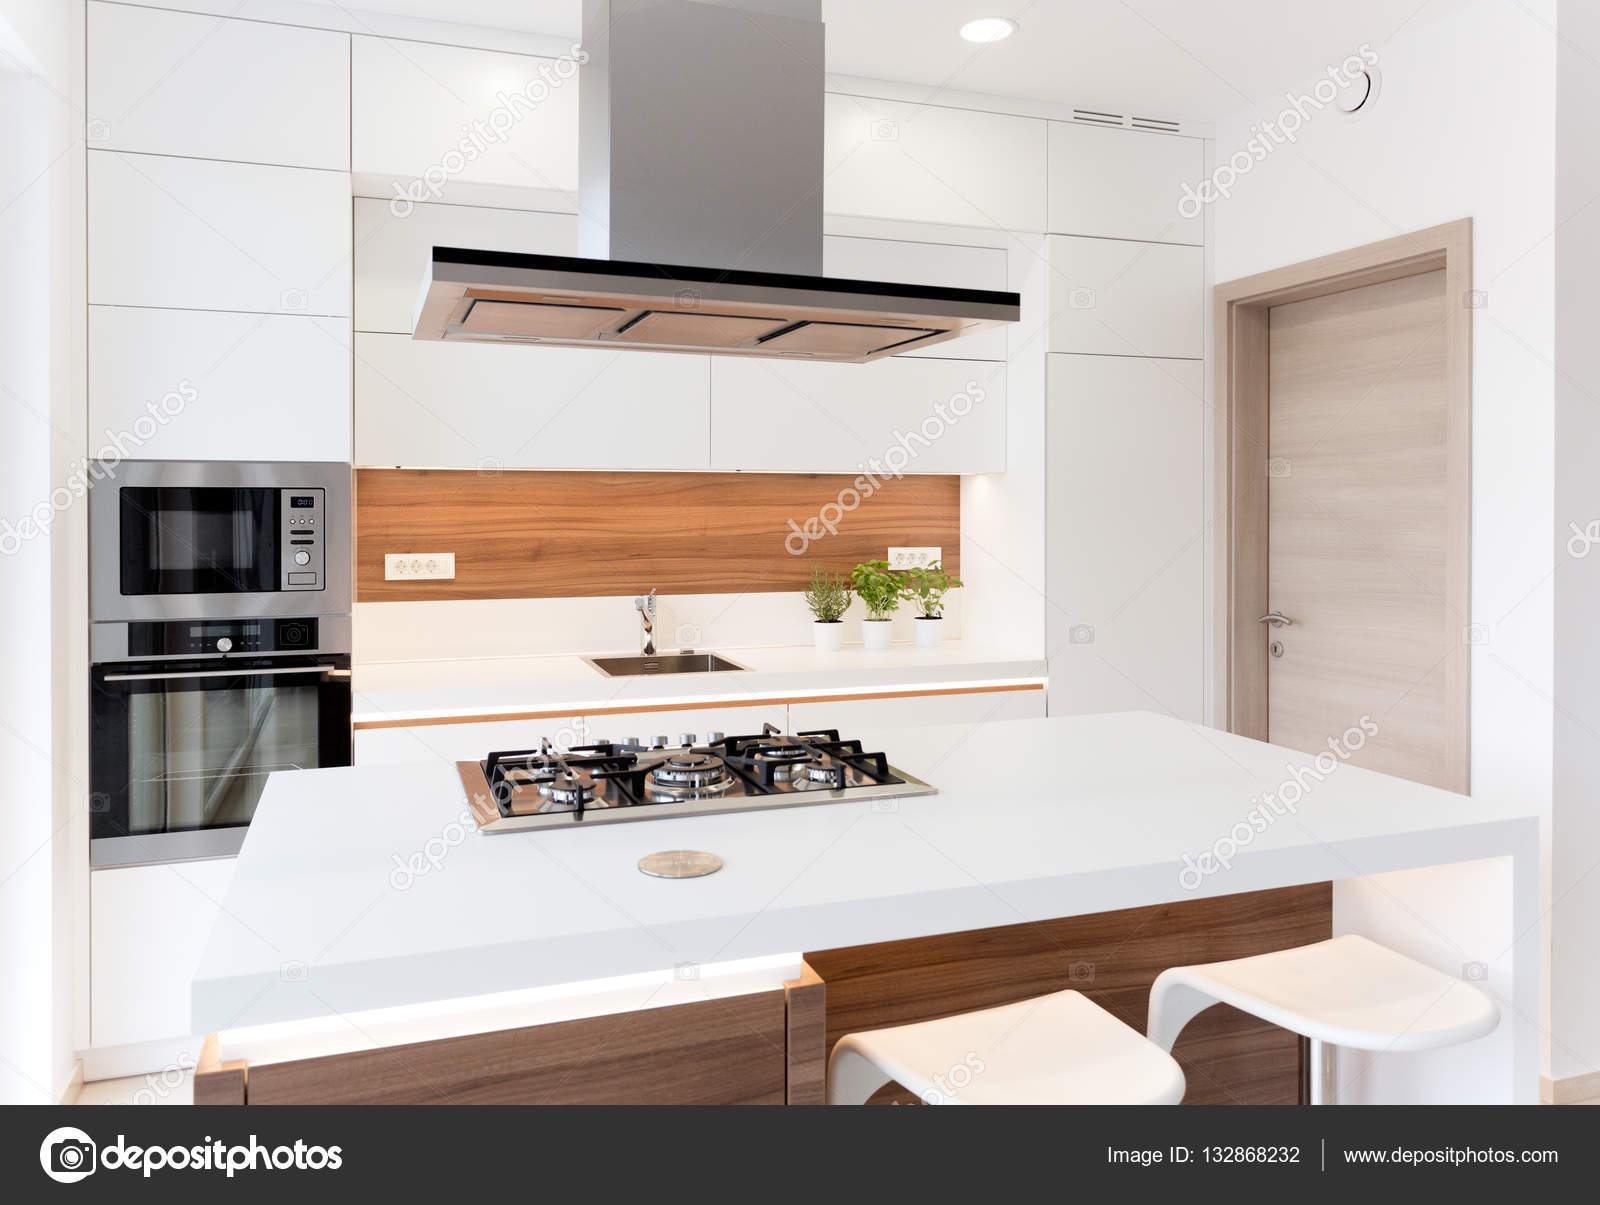 Moderne einfache Küche — Stockfoto © jrp_studio #132868232